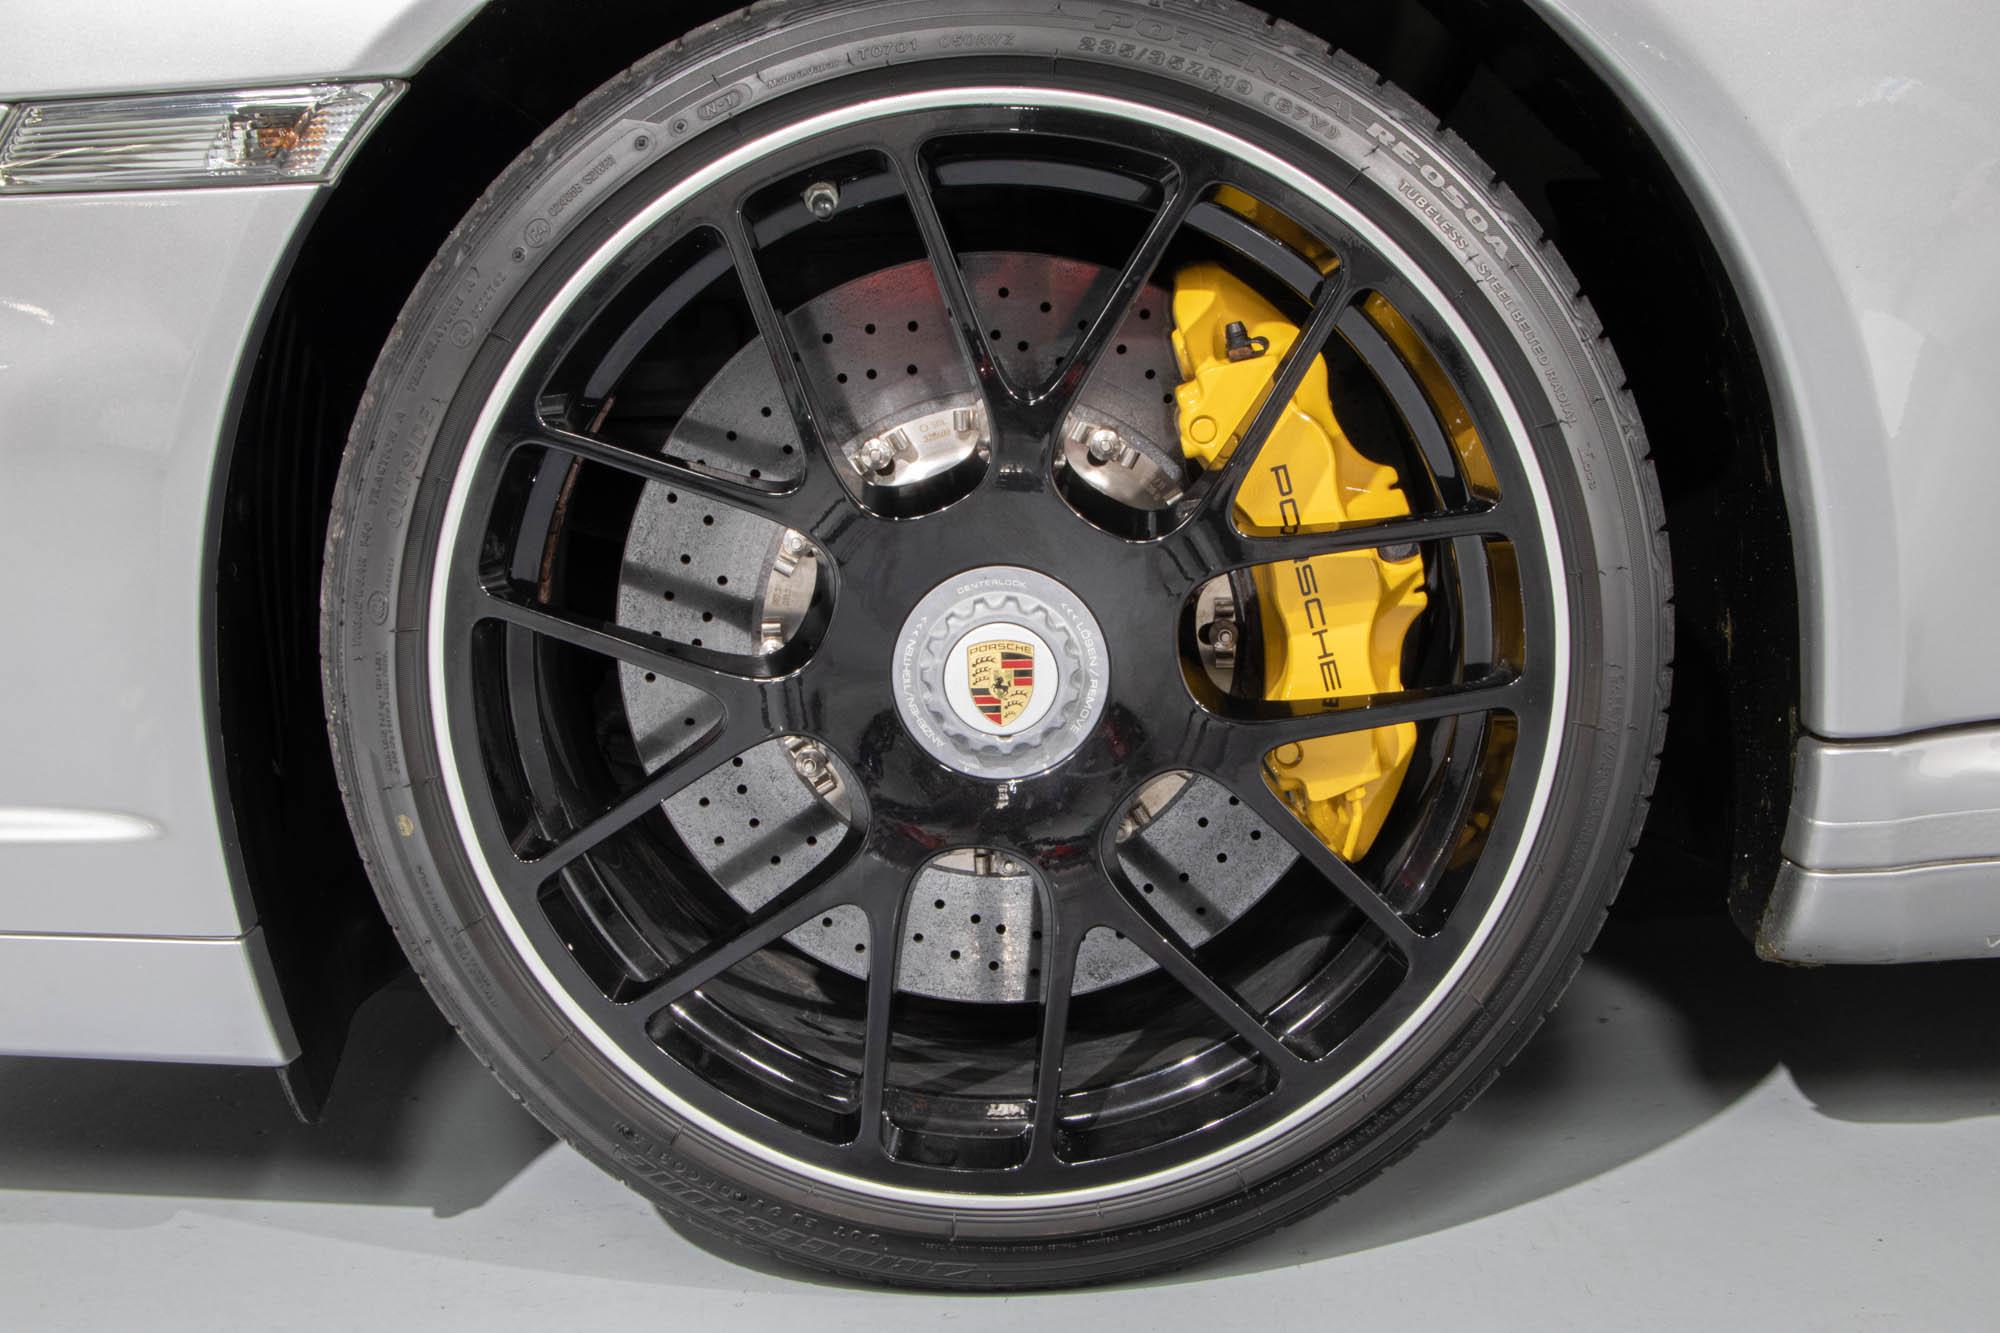 997.2 Turbo S Silv-9